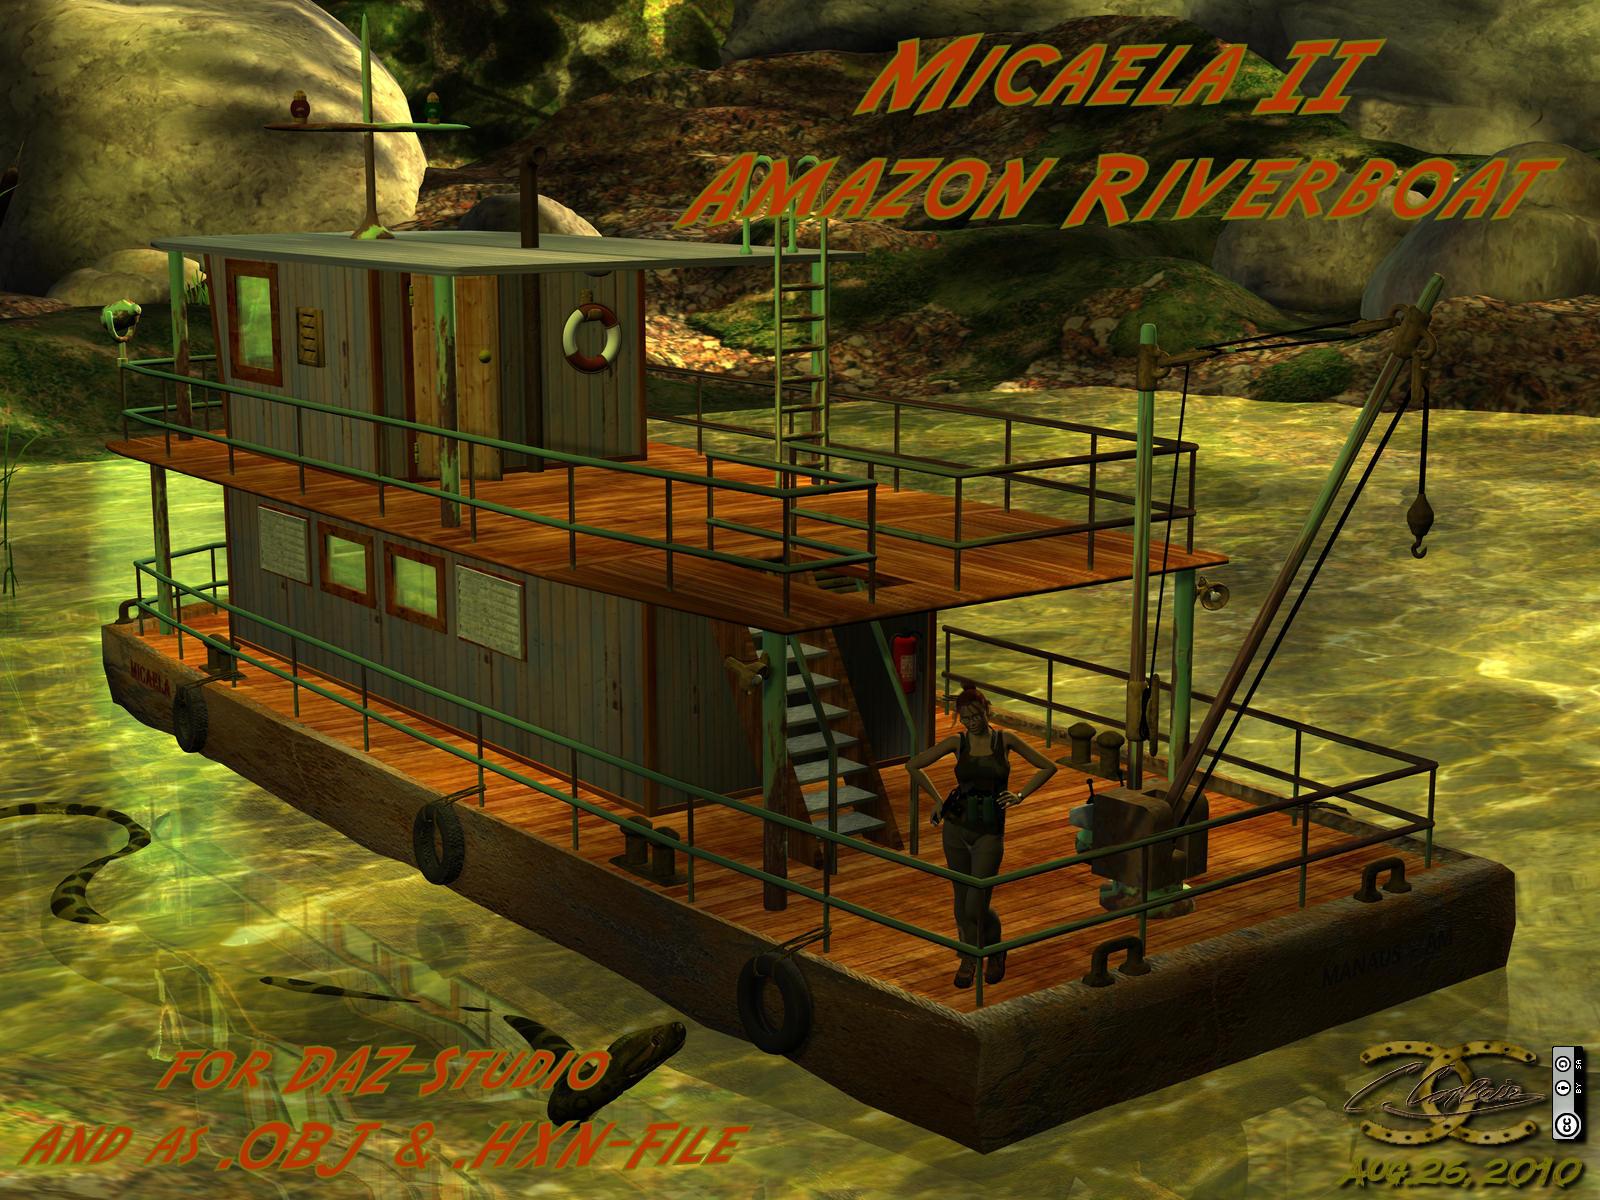 Riverboat as .OBJ and for Poser/DAZ-Studio by ancestorsrelic